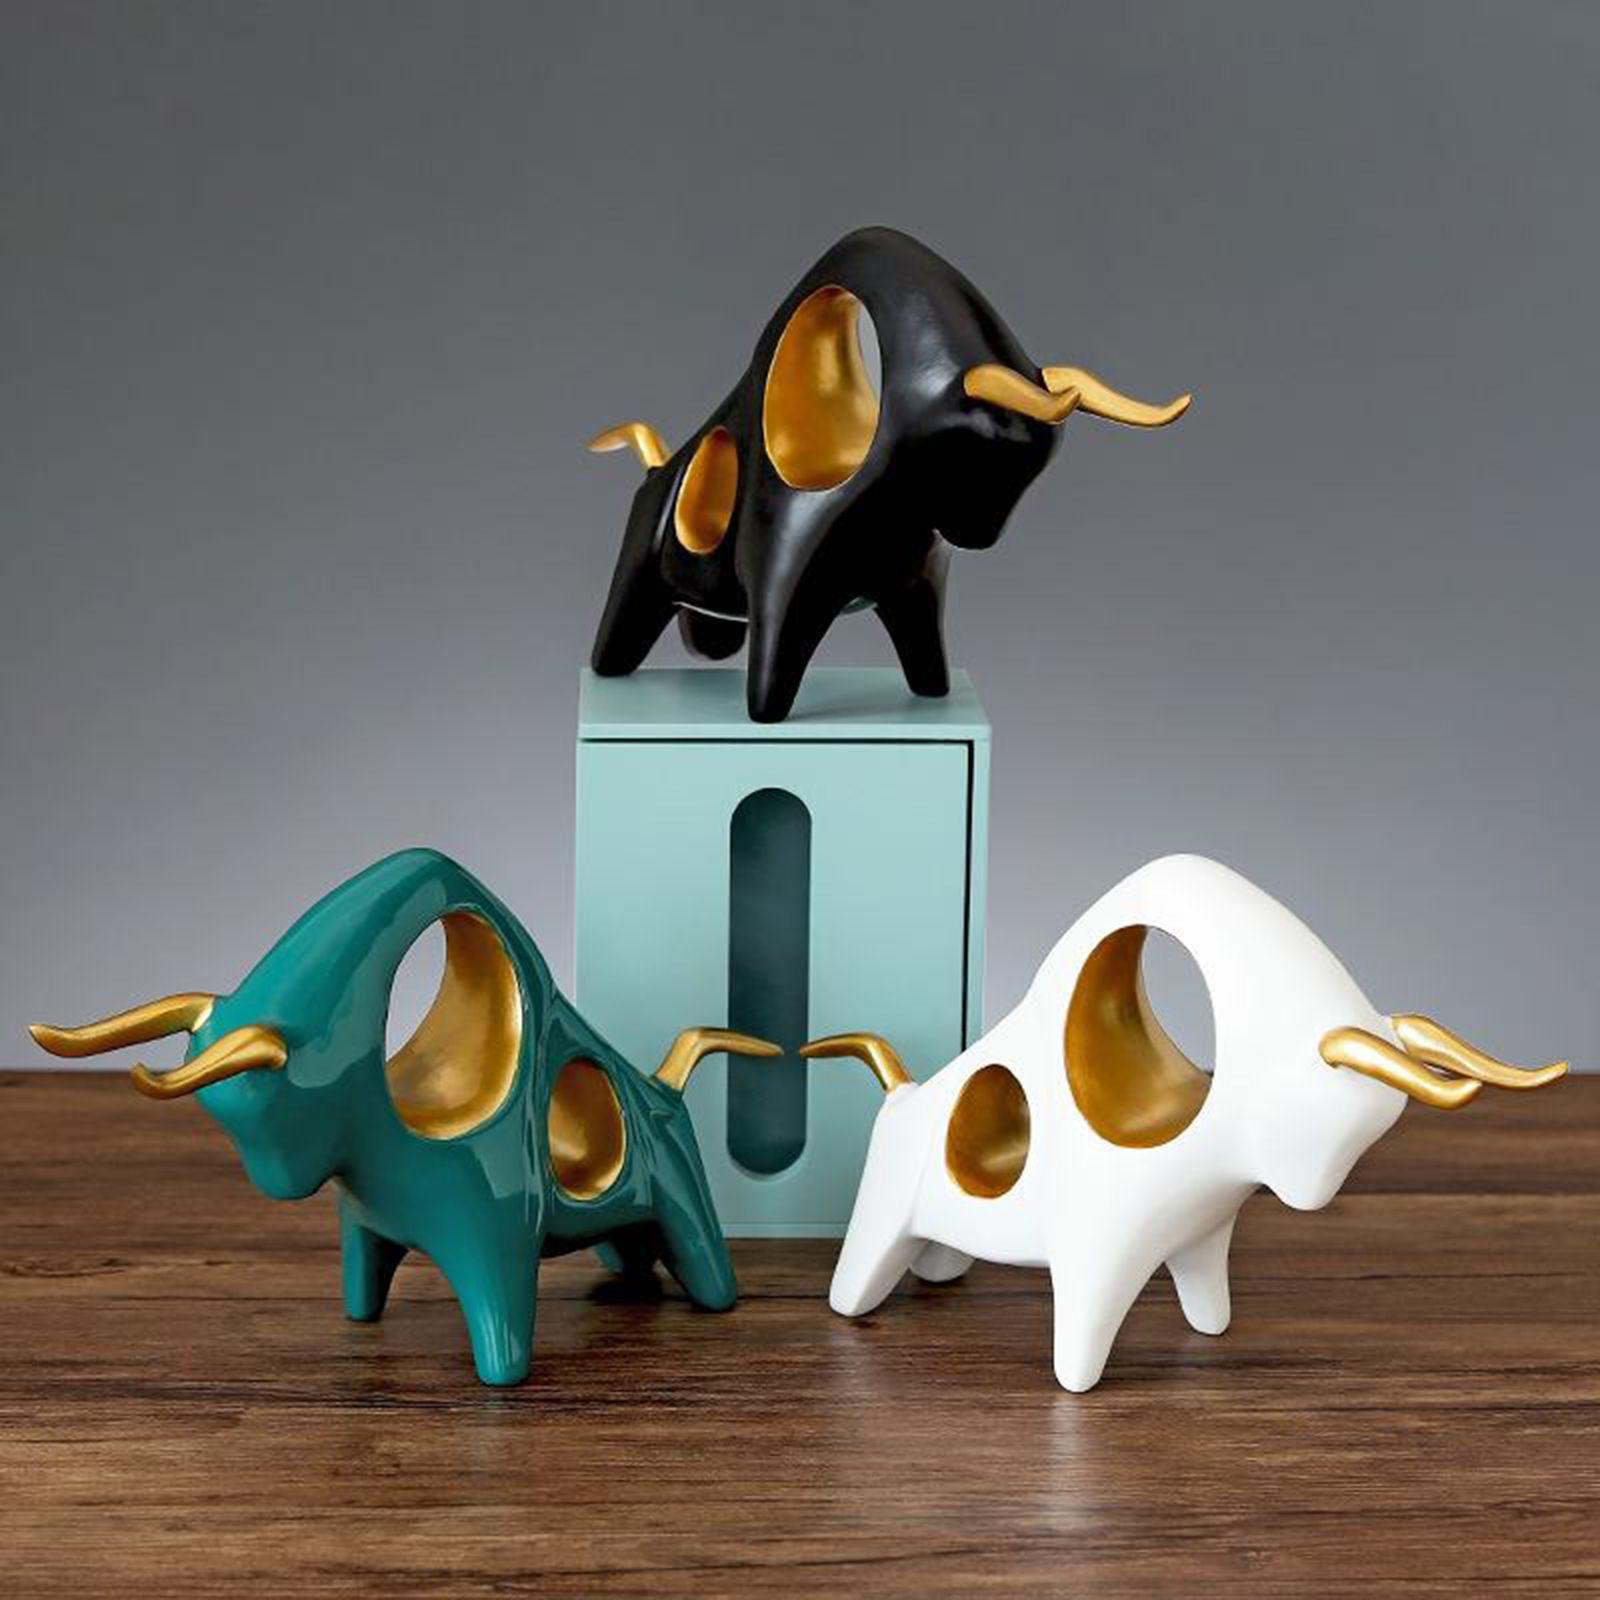 Escultura de OX de resina para decoración de la habitación Escultura artesanal de arte para sala de estar Pasillo Habitación Consola de consola Decoración del hogar